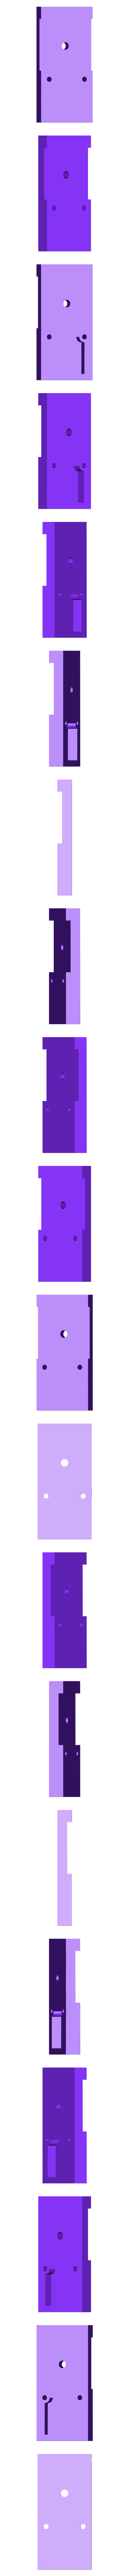 Supporto_fine_corsa_Asse_Z_U30Verticale.stl Download free STL file Alfawise U30 Z Stop • Model to 3D print, Scigola